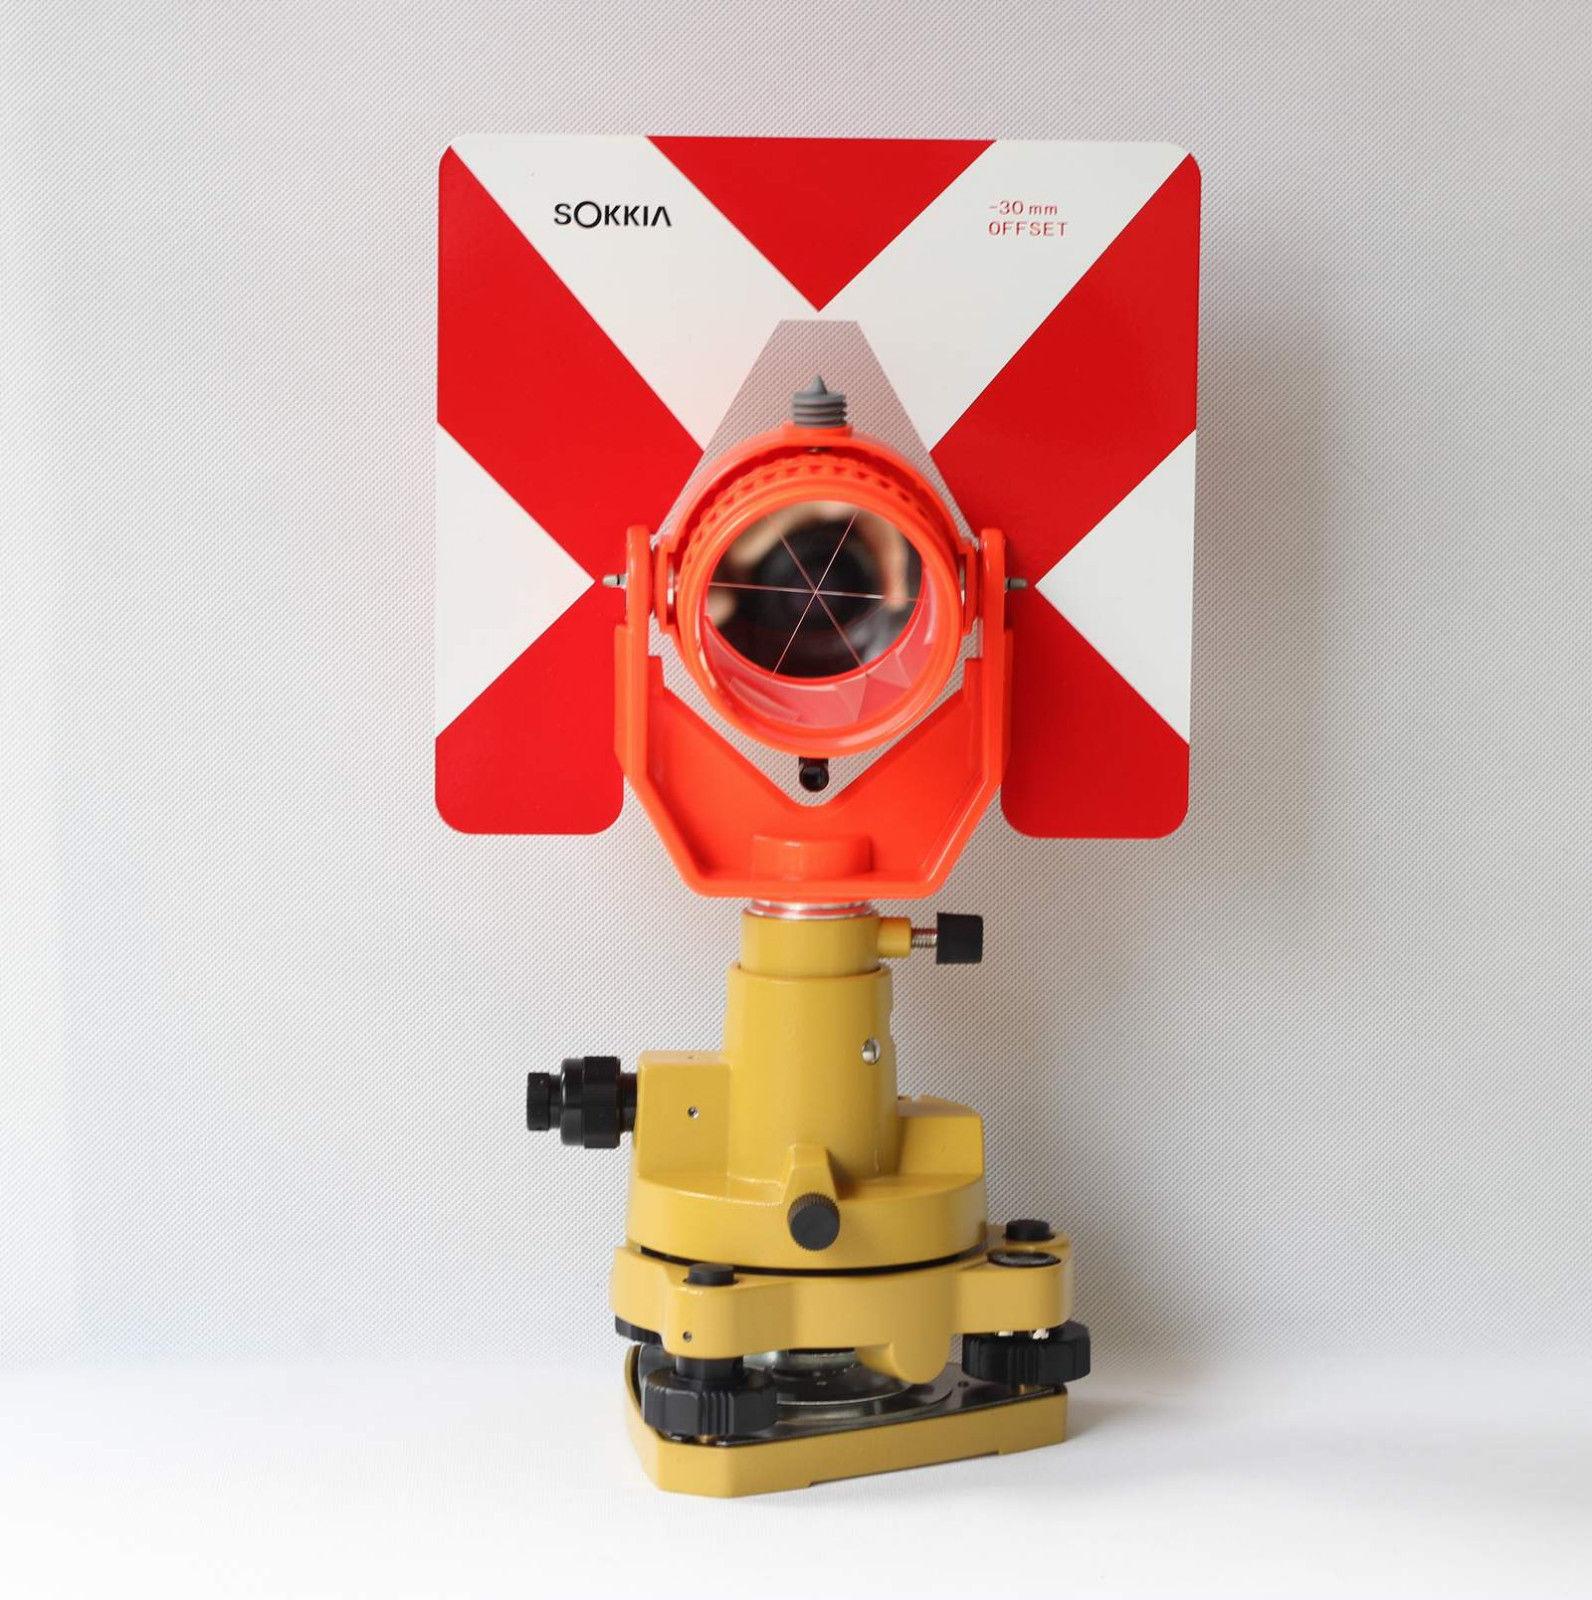 NEW Single Prism Tribrach Set system for total station surveying